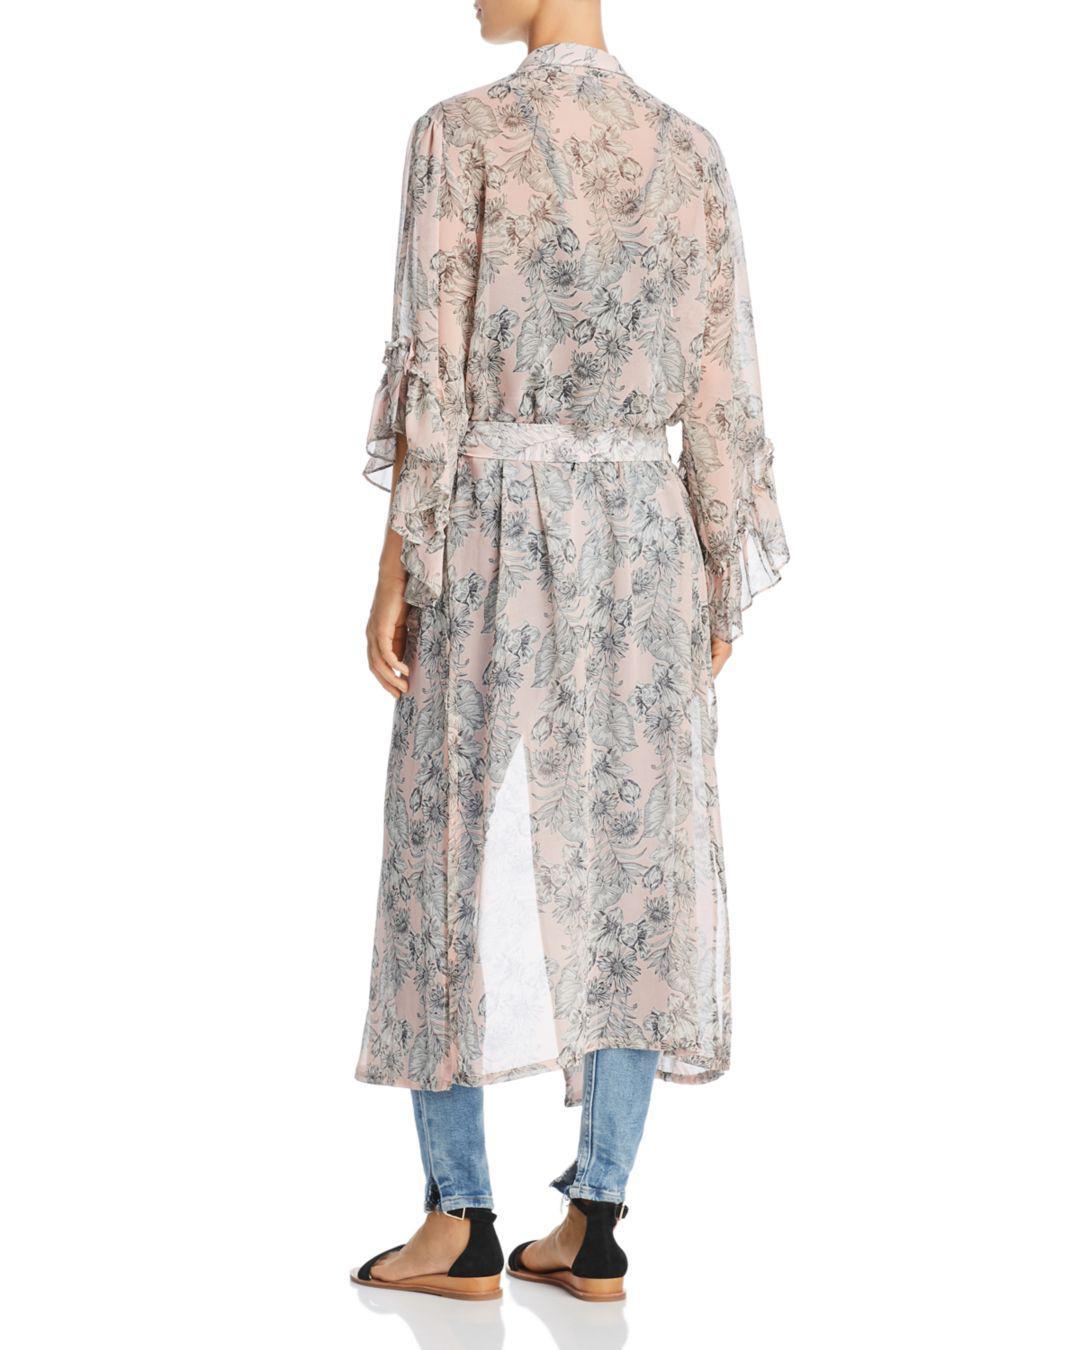 d516fde5 MISA Amina Floral Kimono - Lyst